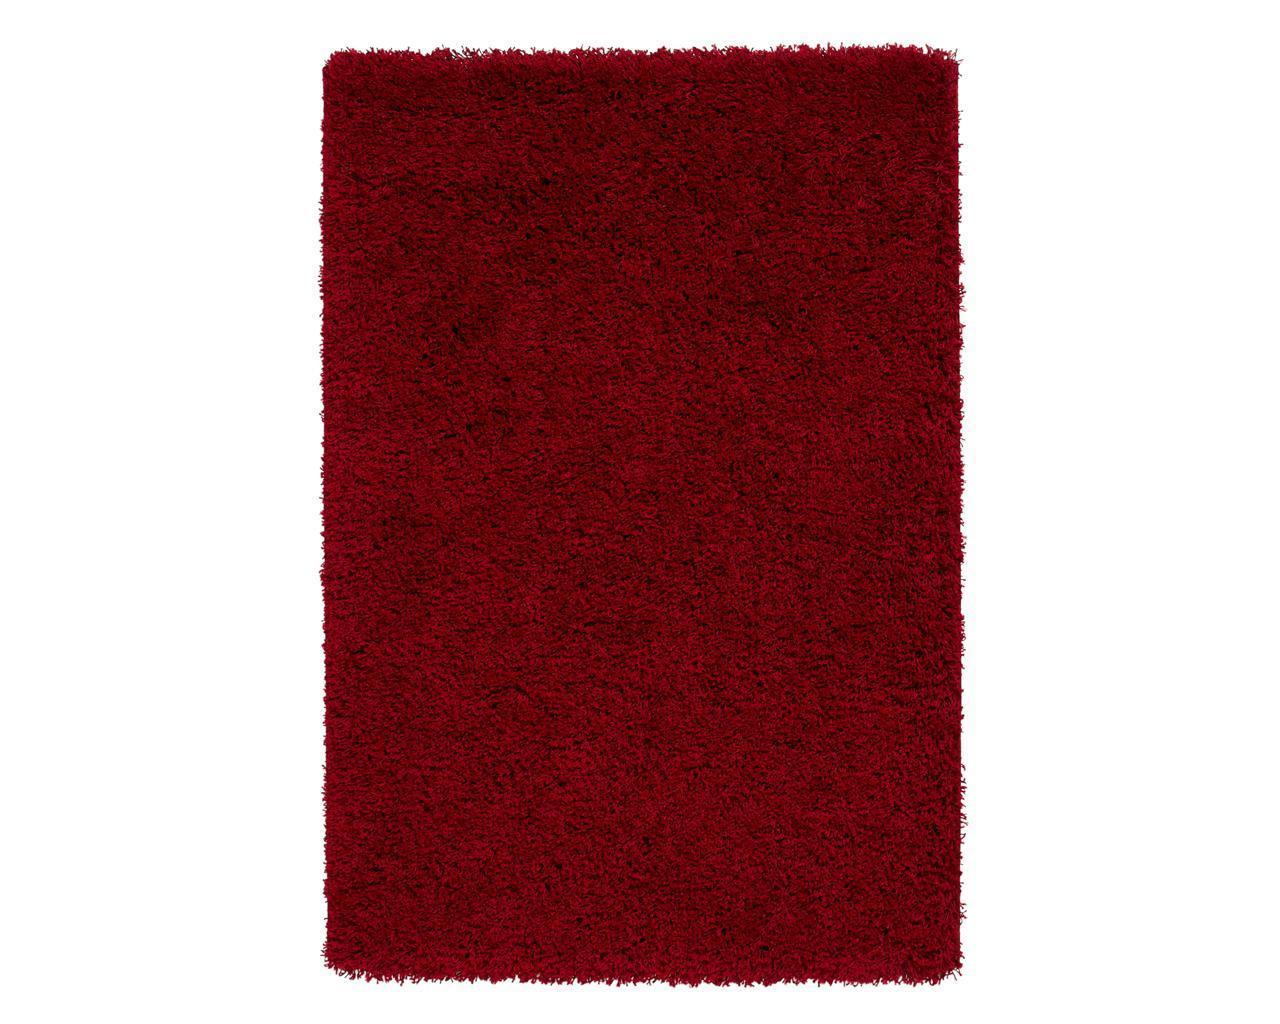 Covor Vista Red 120x170 cm - Think Rugs, Rosu imagine